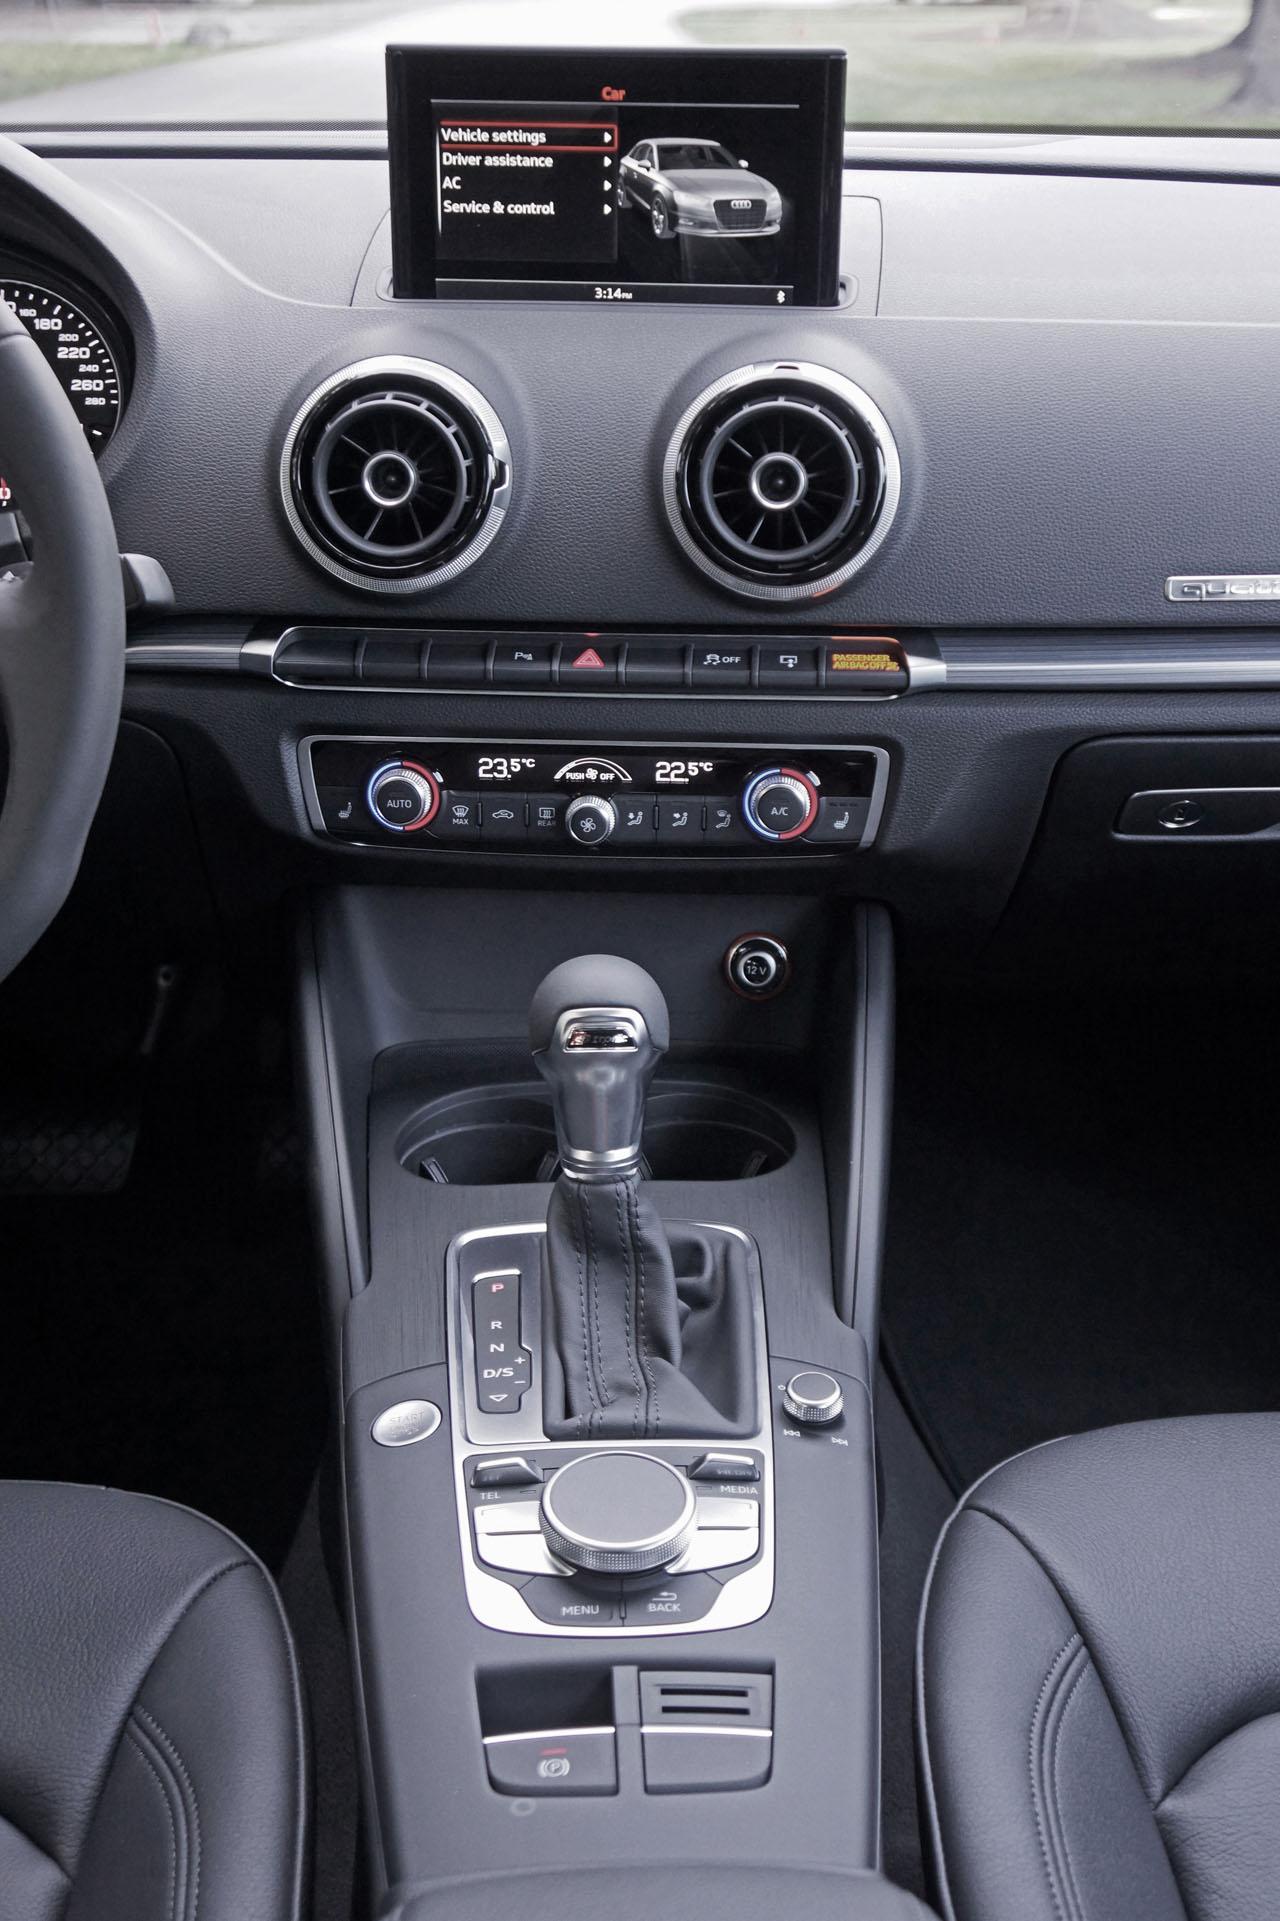 2016 Audi A3 2 0 TFSI Quattro Technik Road Test Review